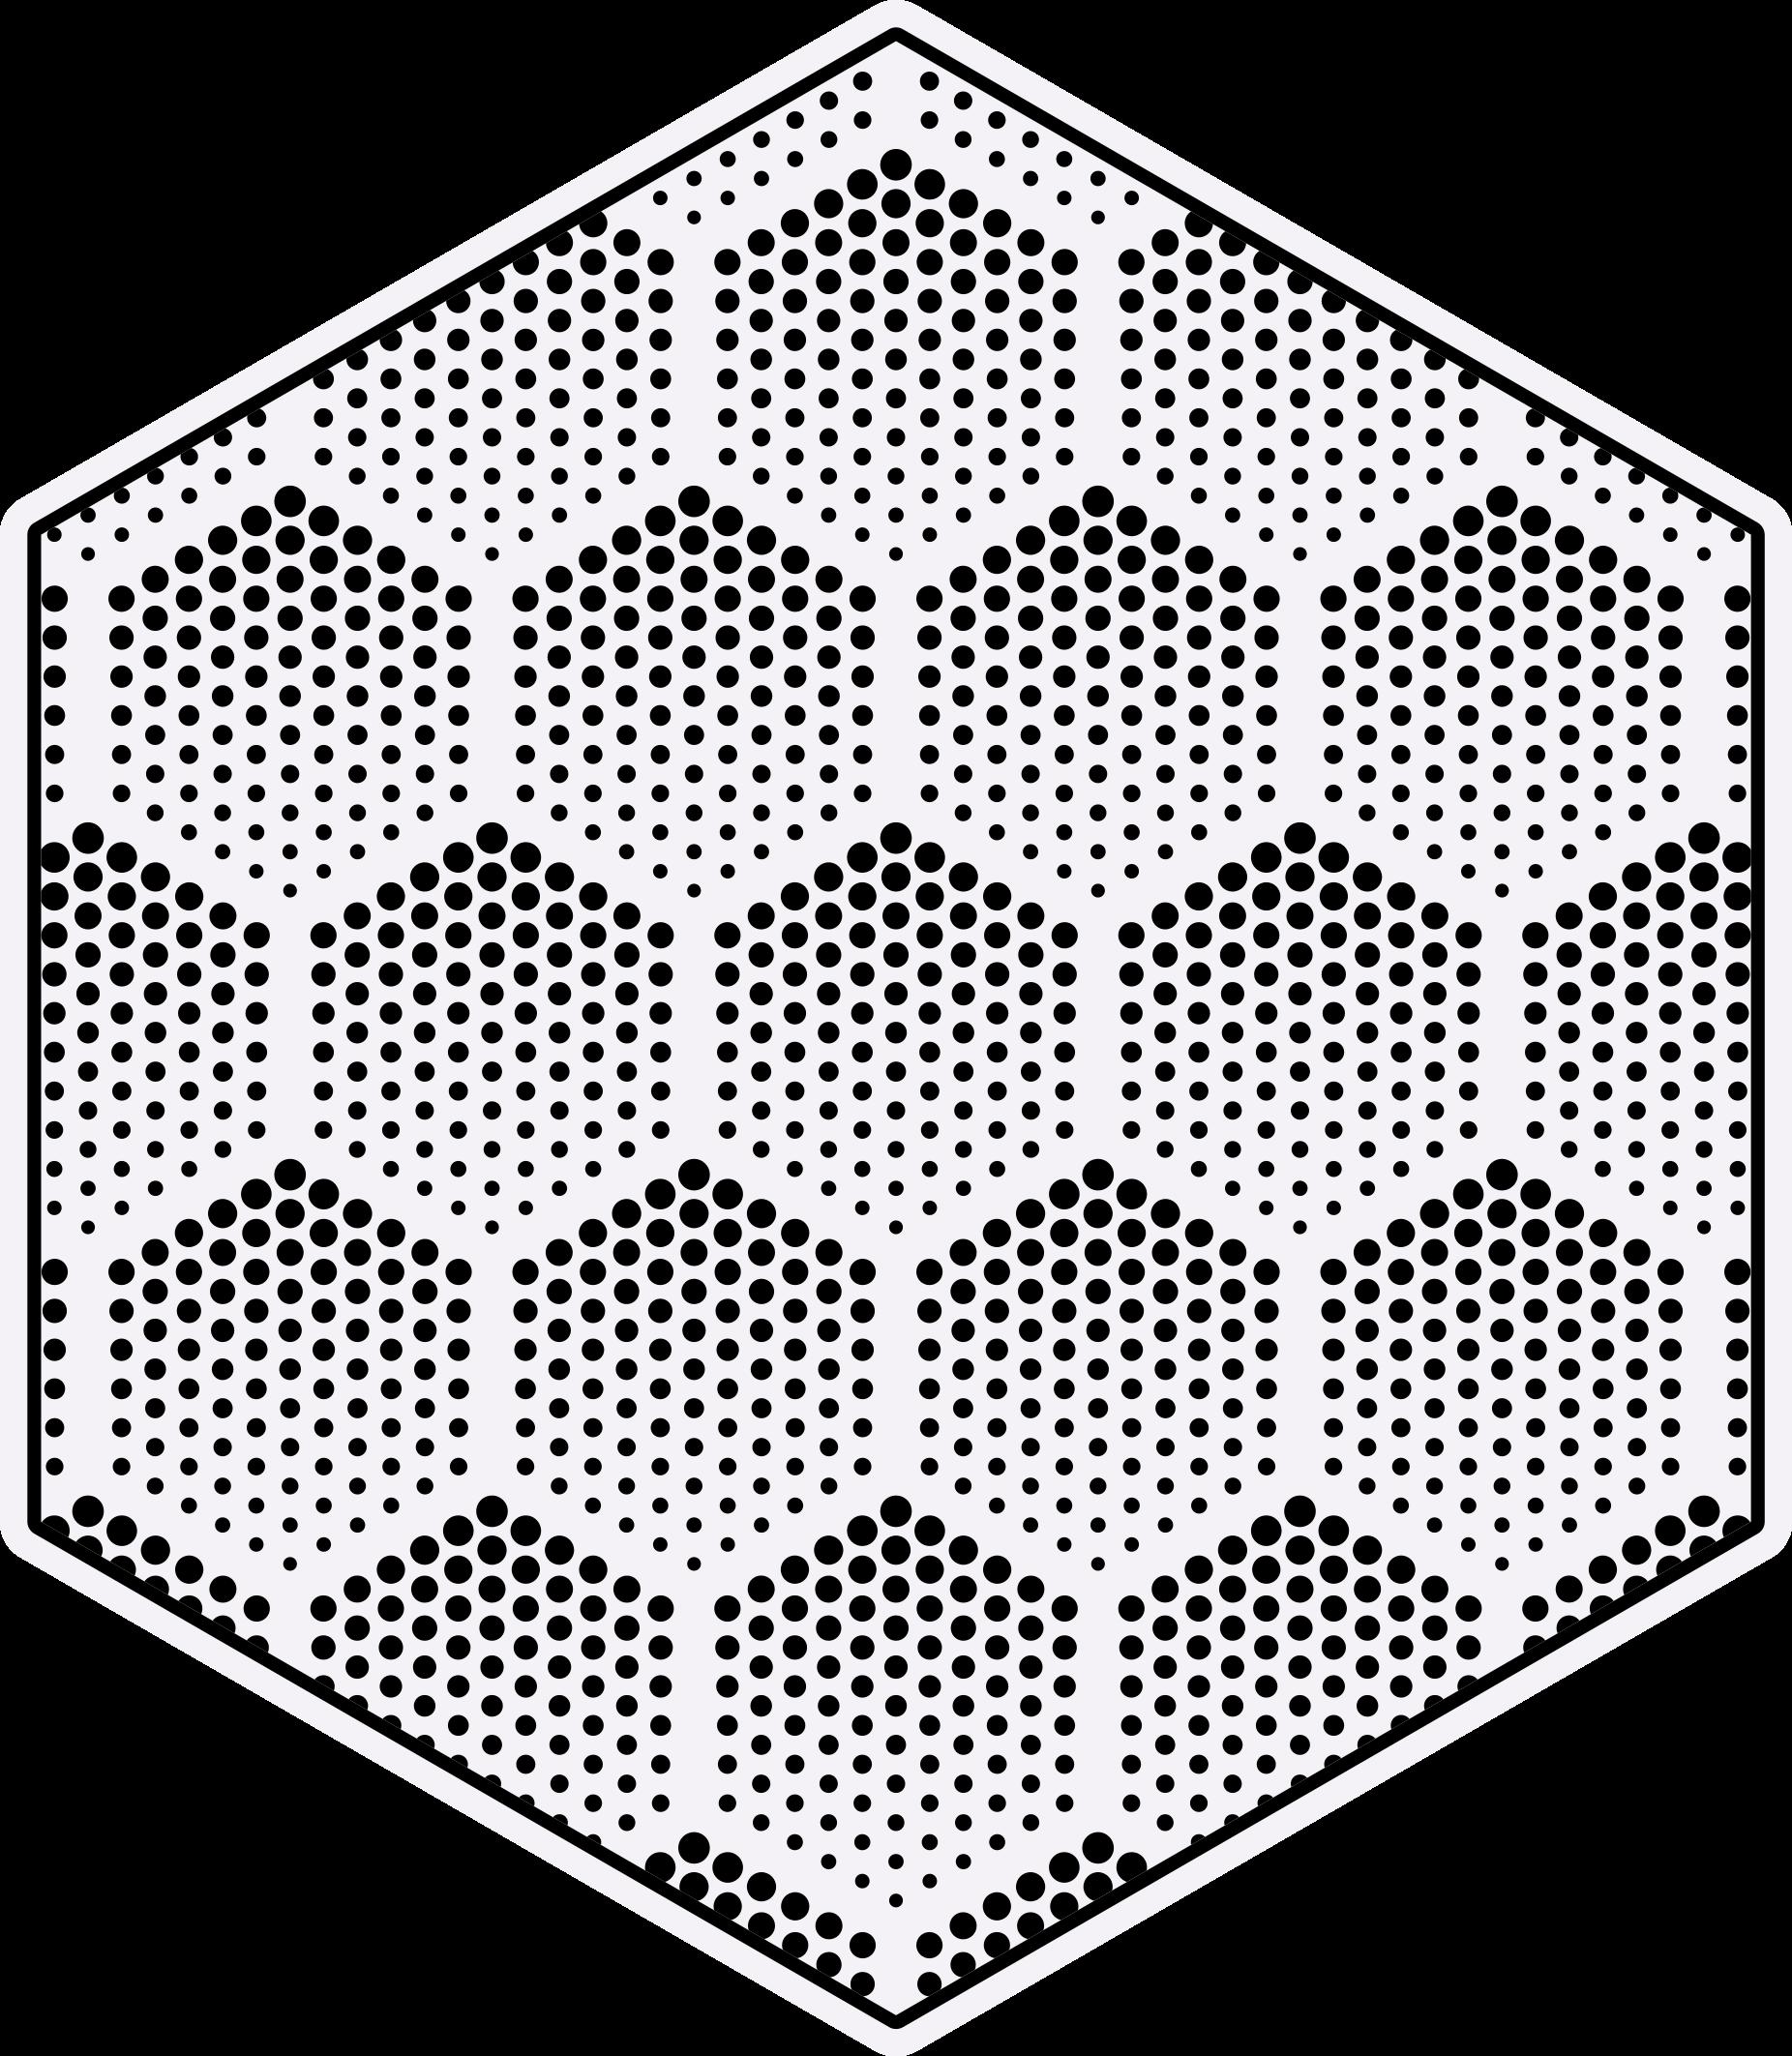 TenStickers. κουκκίδες γεωμετρικά χαλιά. βελτιώστε το σπίτι σας χωρίς να χρειαστεί να ξοδέψετε πολλά χρήματα με το υψηλής ποιότητας χαλί γεωμετρικού σχήματος βινυλίου. είναι πρωτότυπο και εύκολο να καθαριστεί.